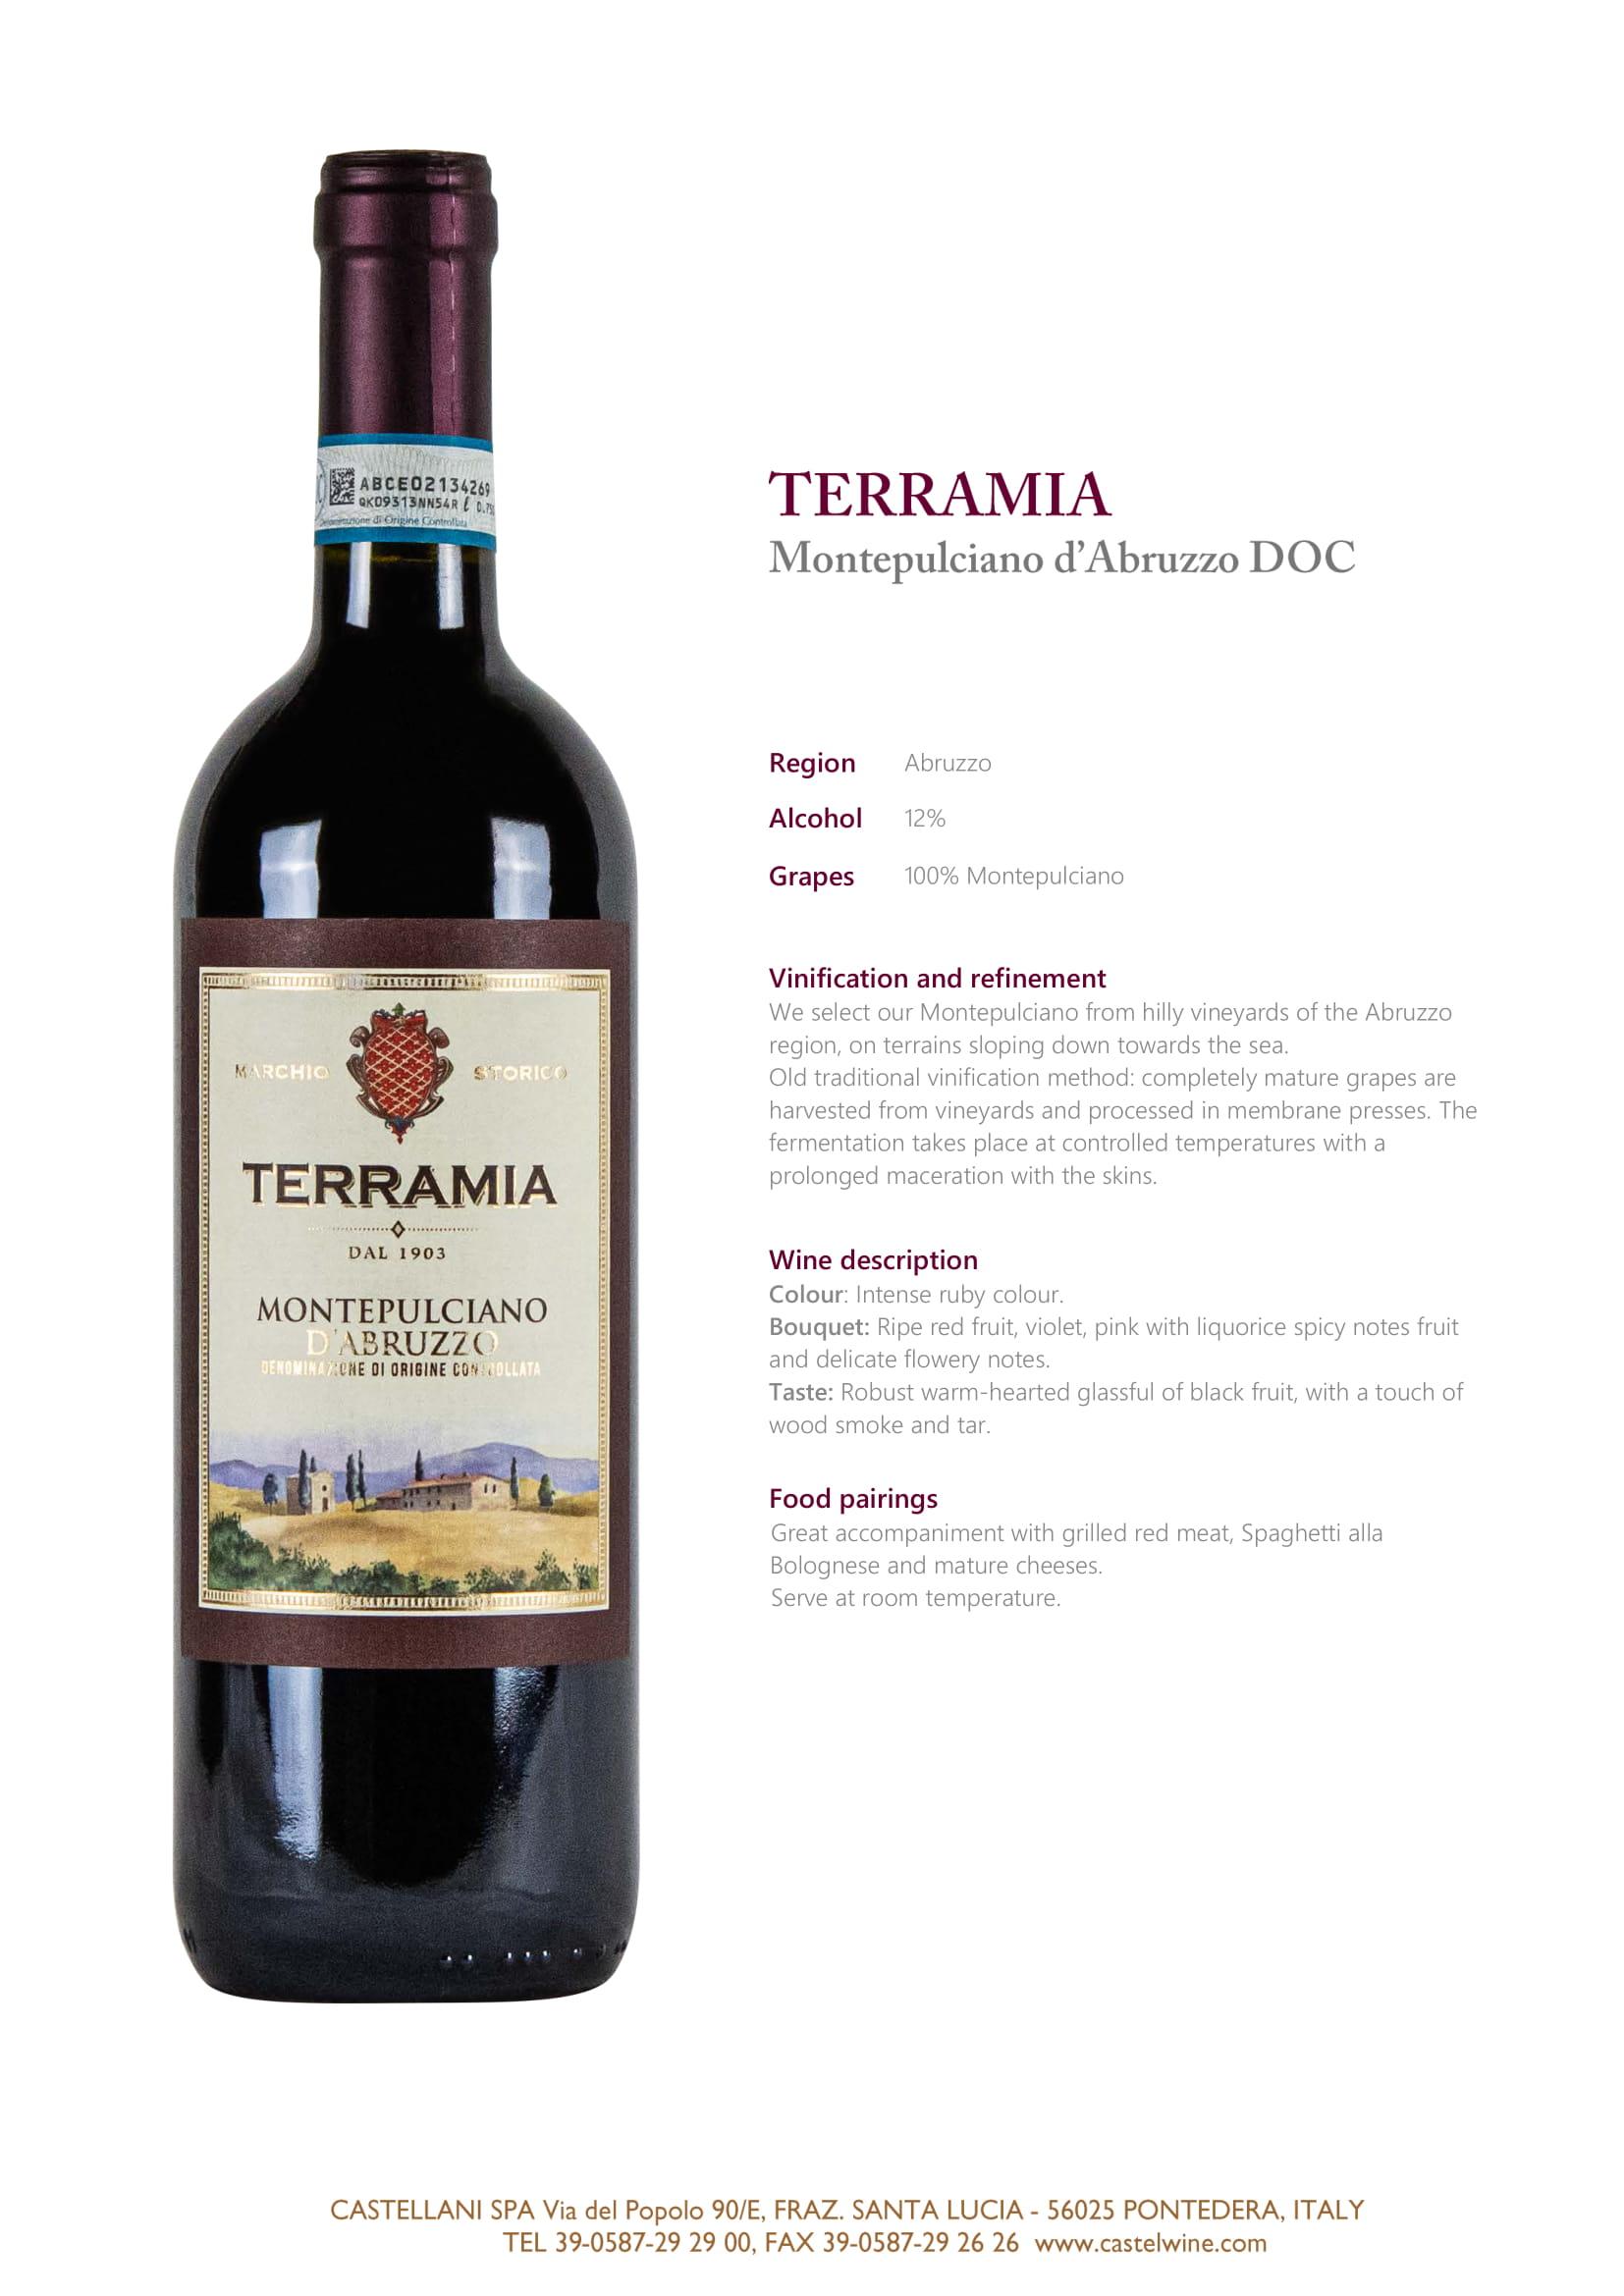 Terramia Montepulciano D'Abruzzo Tech Sheet